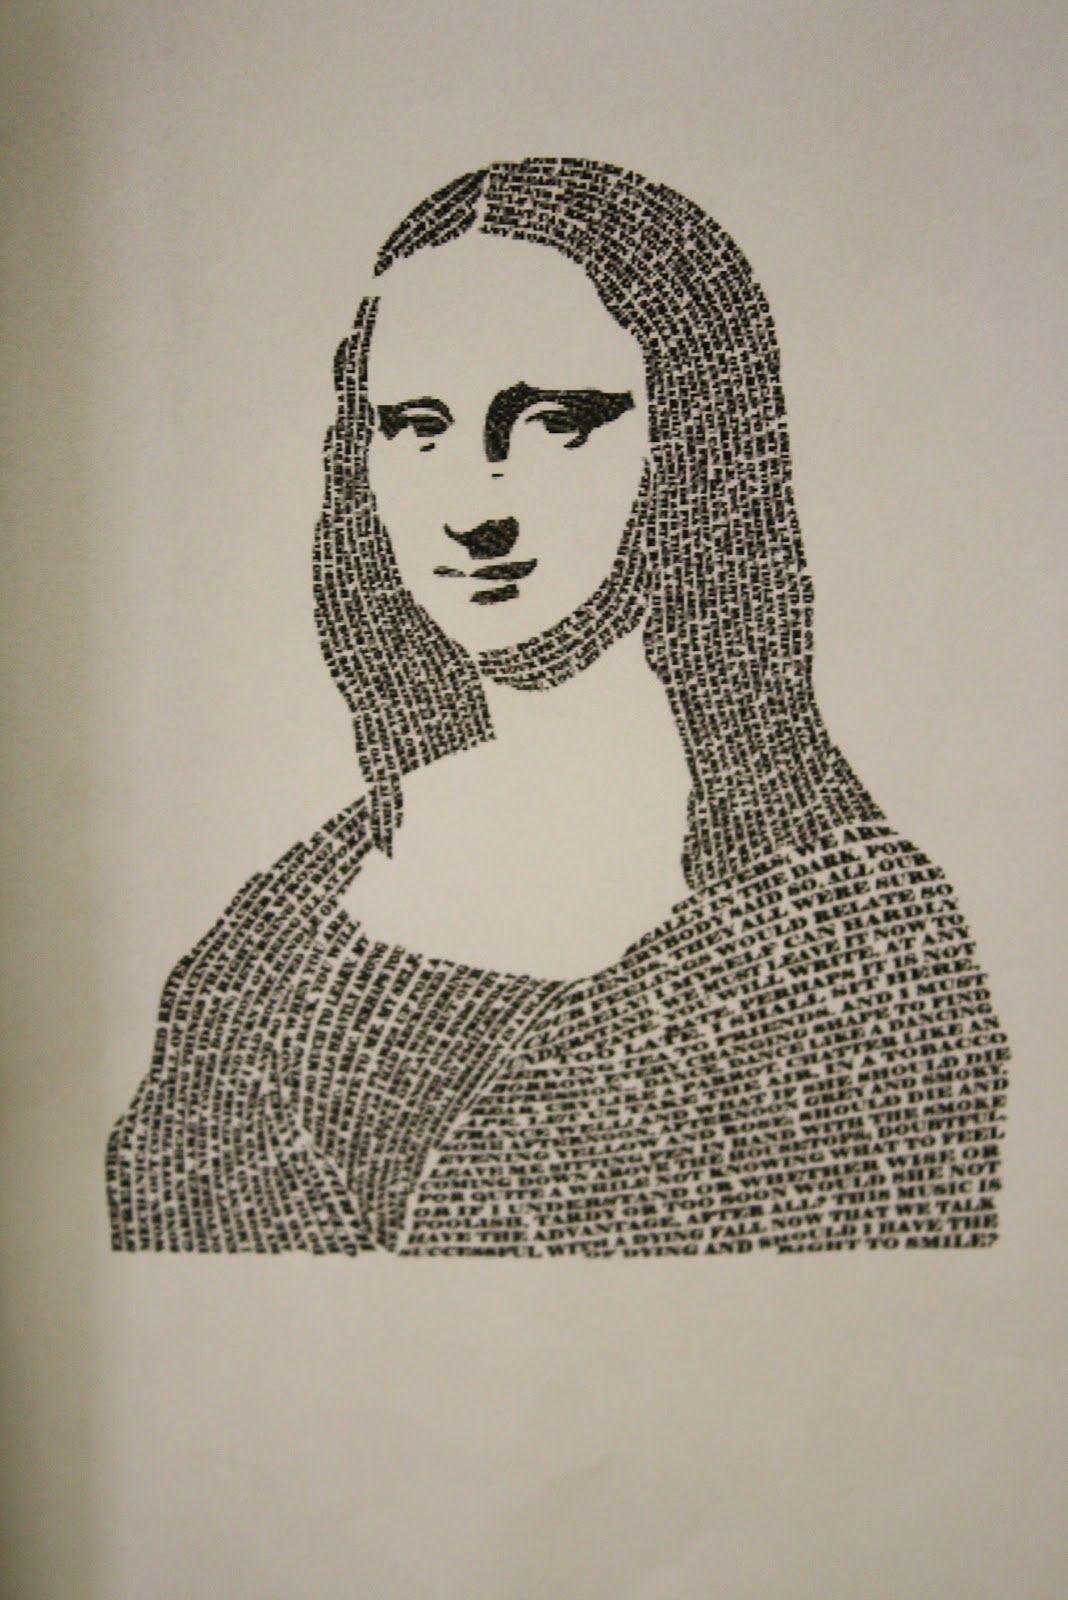 Micrography Portraits | Typography portrait, Text art ...